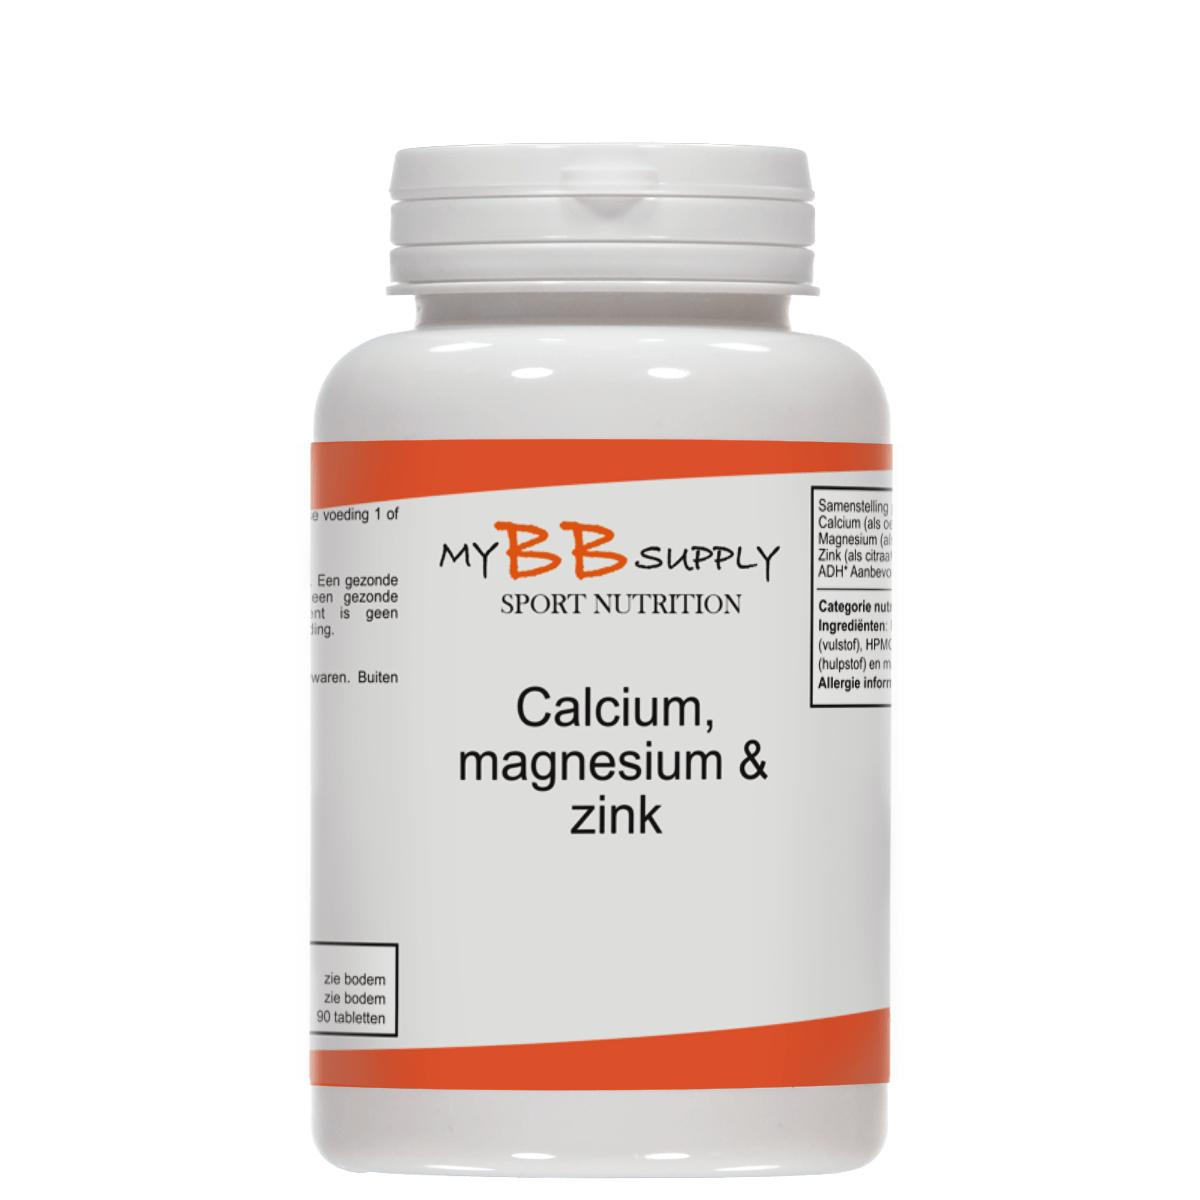 mybbsupply Calcium-magnesium-zink-